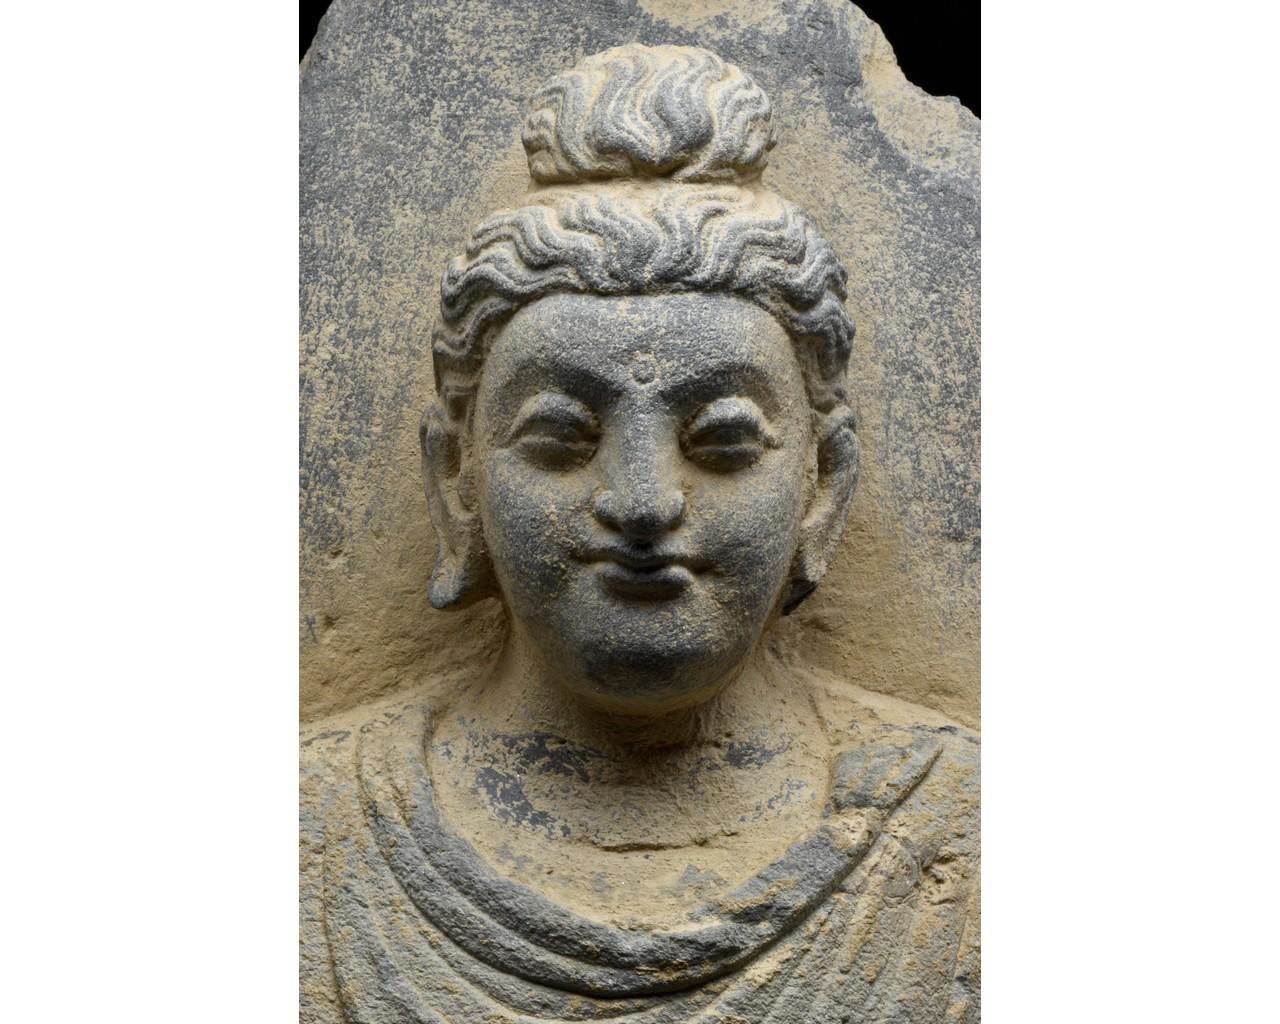 GANDHARA SCHIST TORSO OF BUDDHA - Image 4 of 5